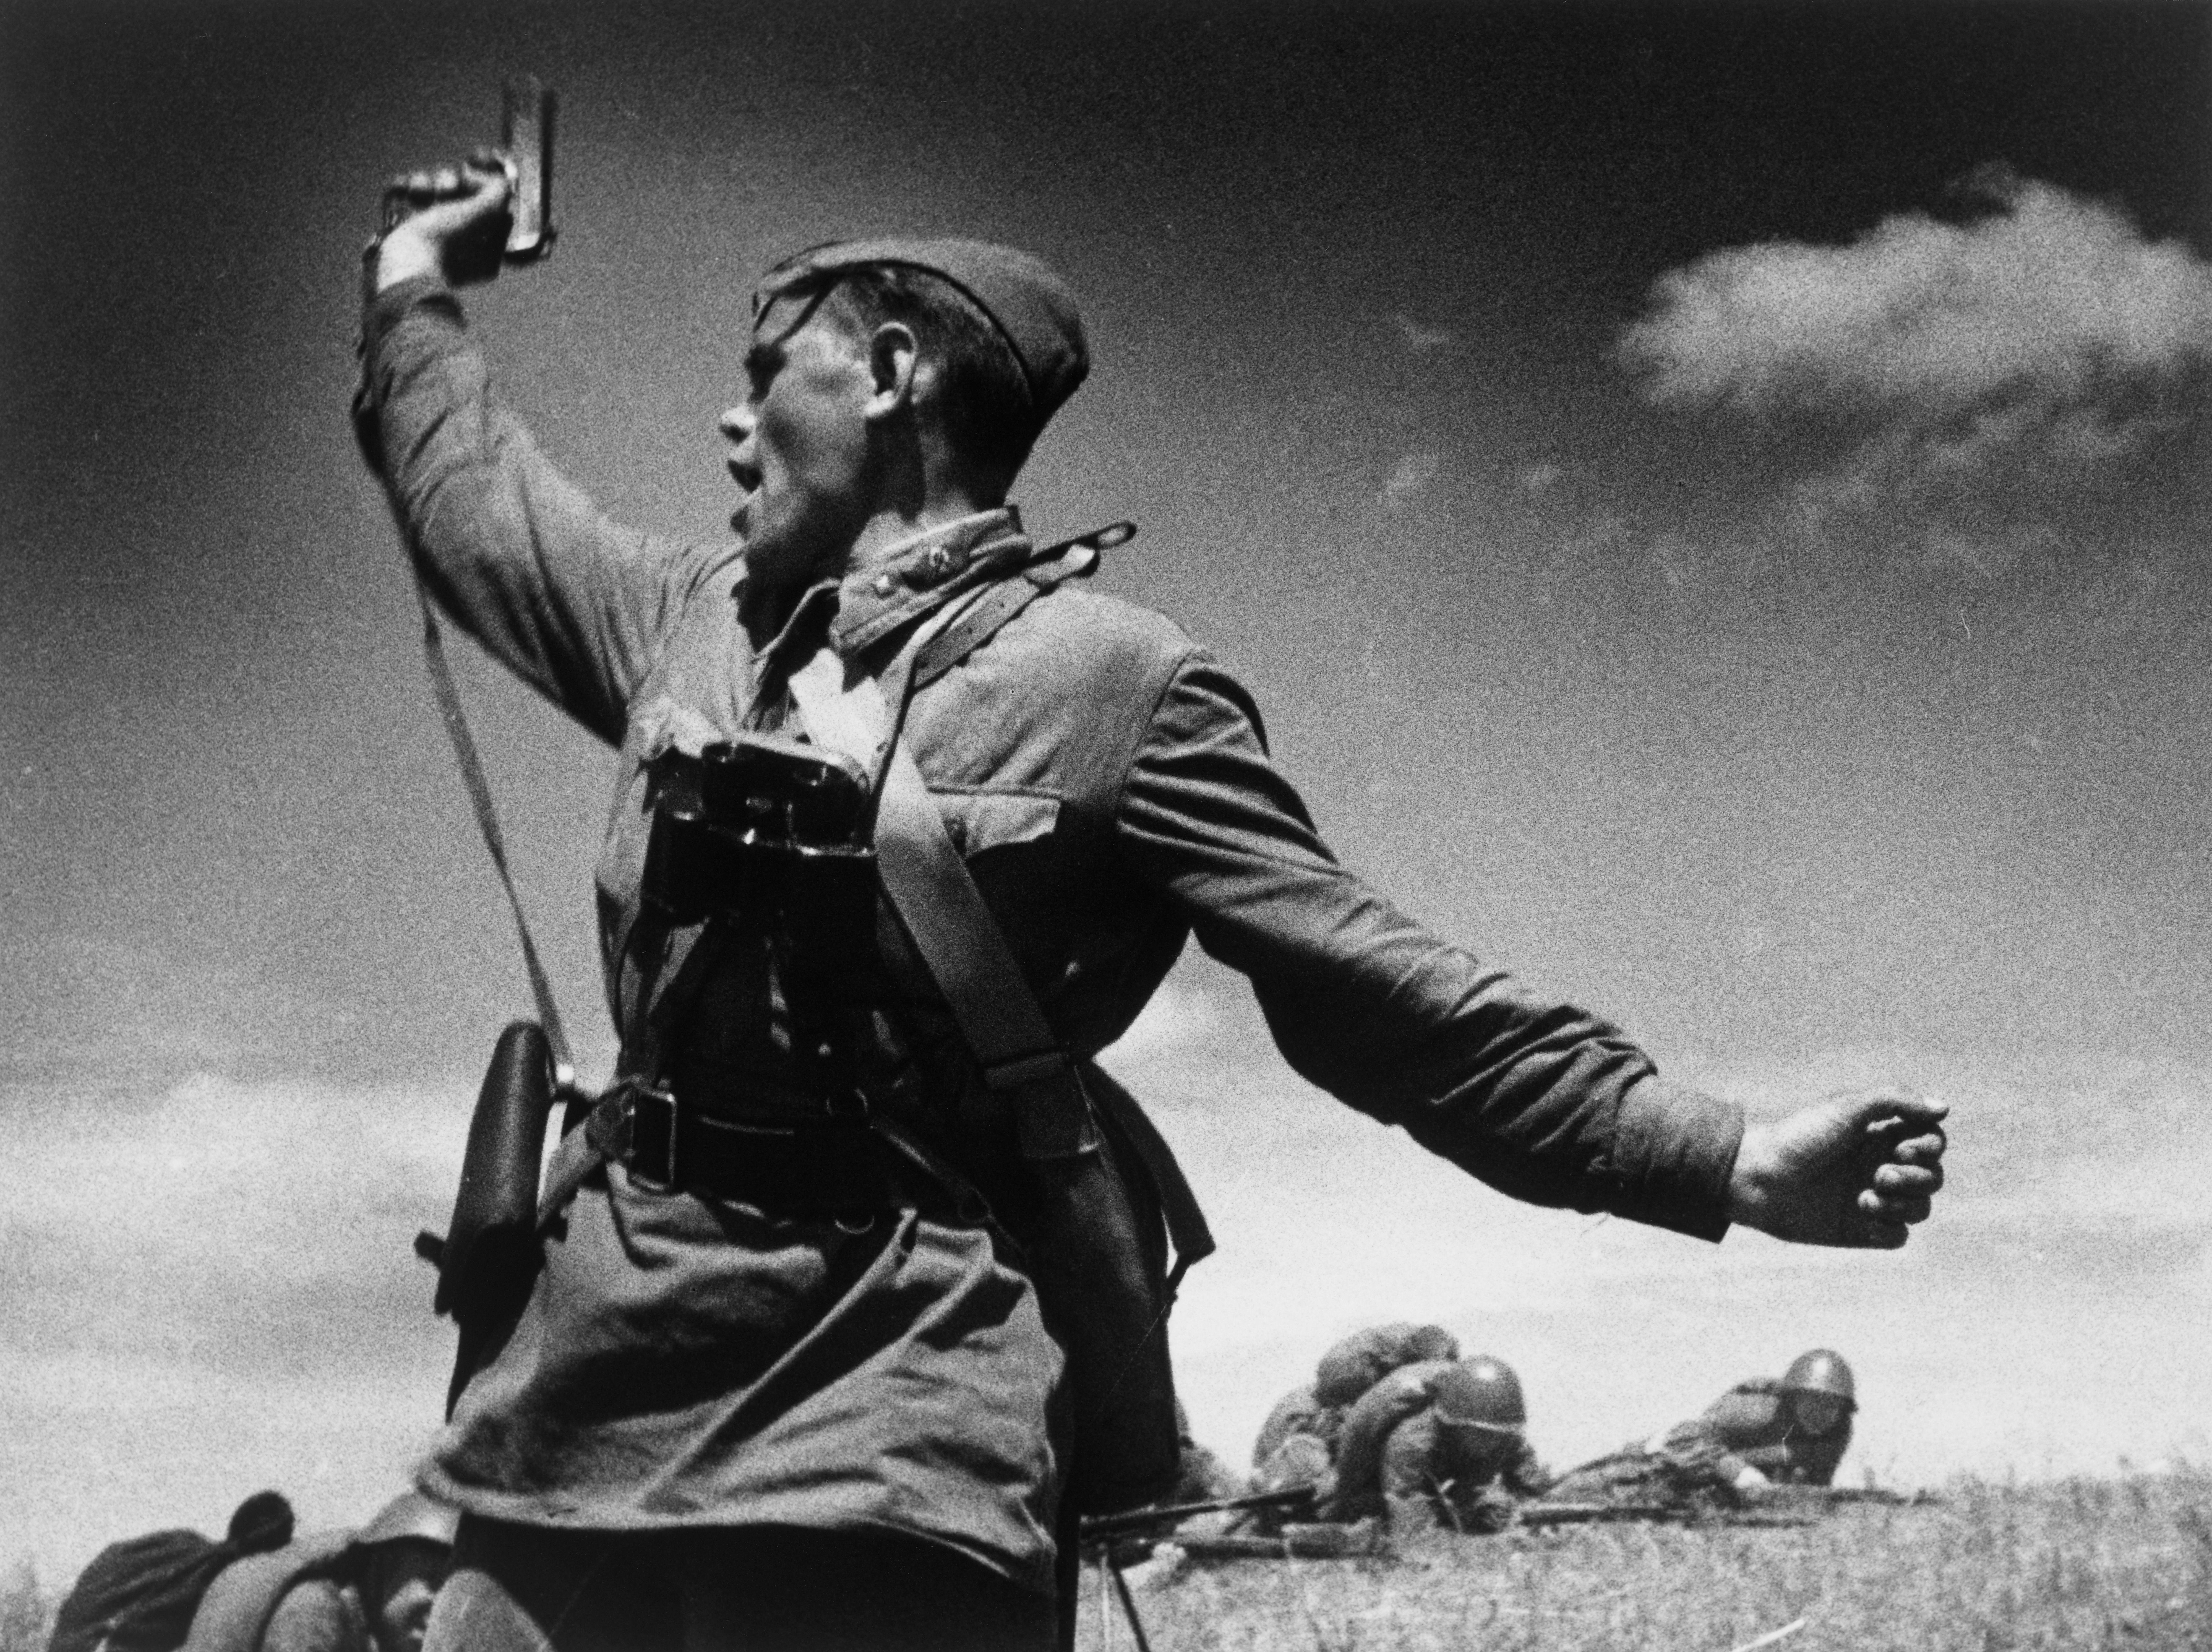 Soviet Officer Purge a Soviet Officer Thought